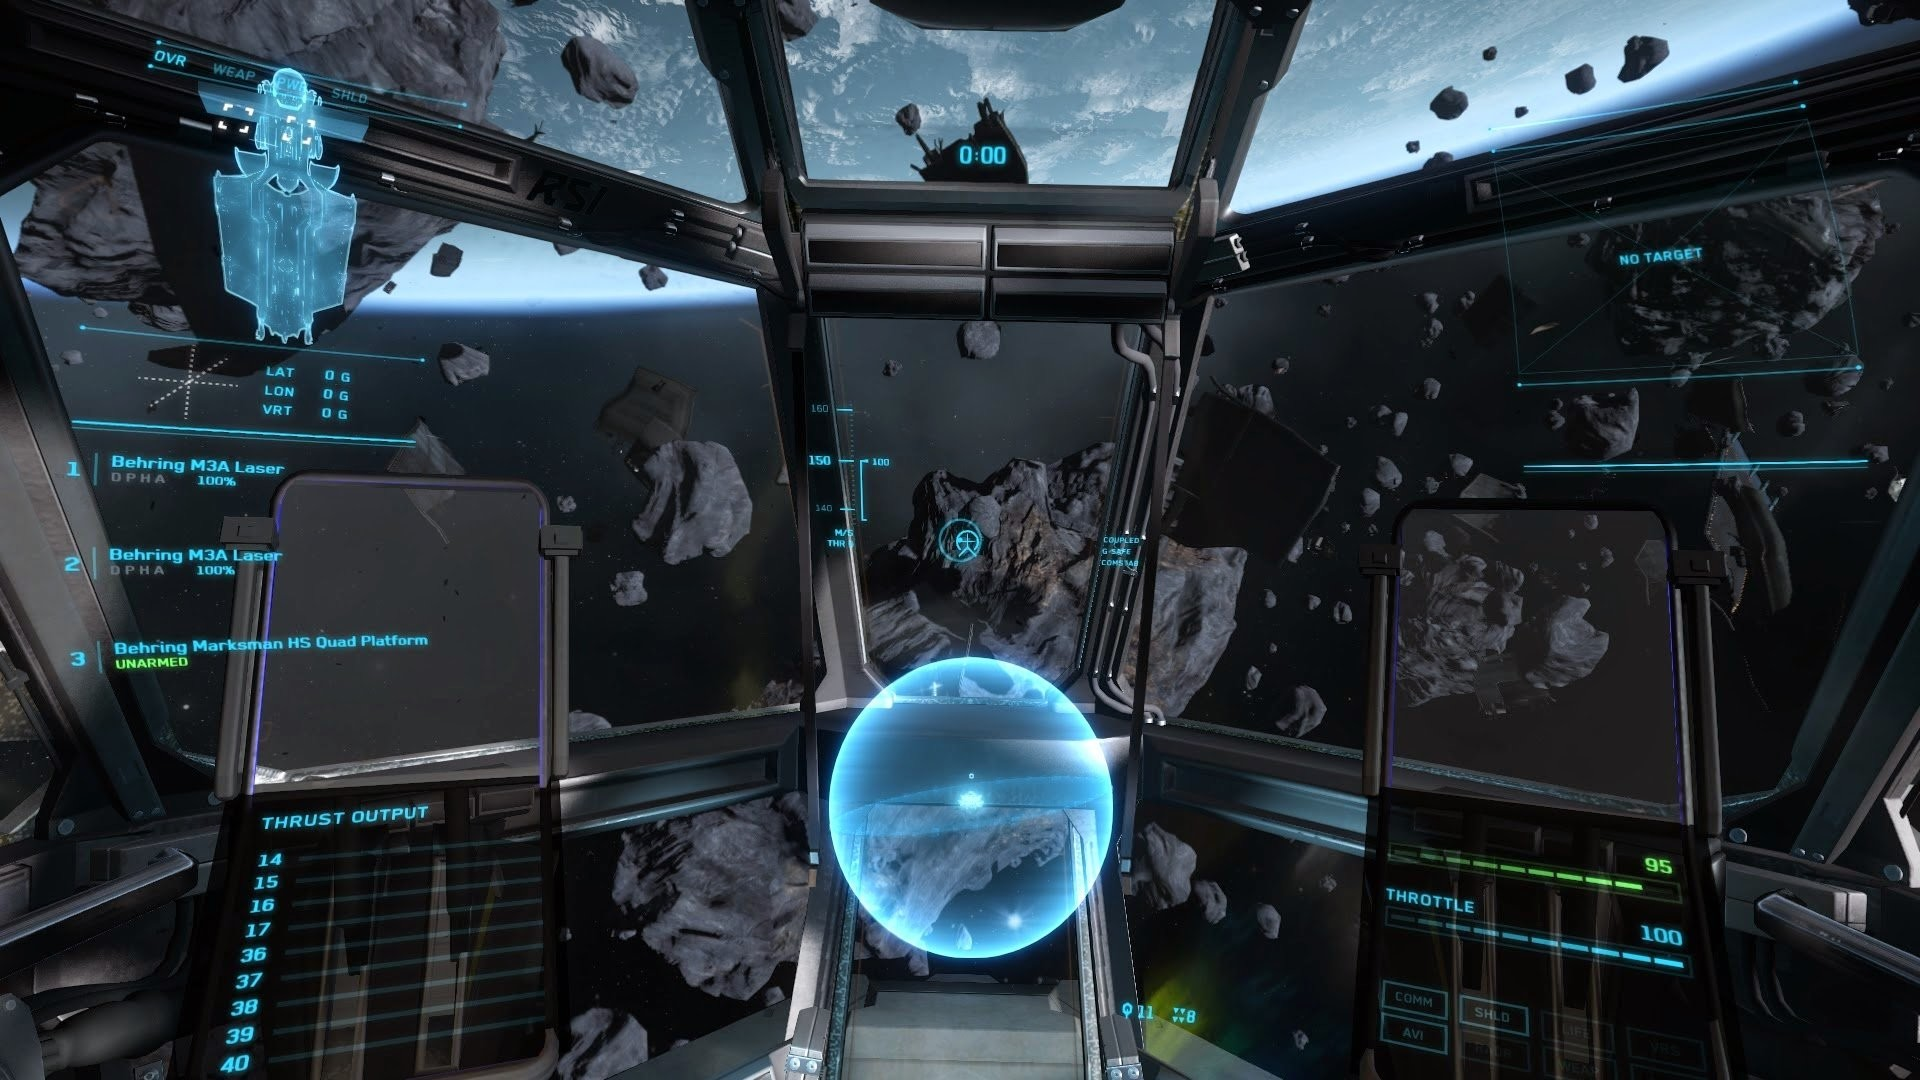 STAR CITIZEN simulator sci-fi spaceship space action fighting fps shooter  futuristic 1citizen startegy tactical wallpaper     683427    WallpaperUP